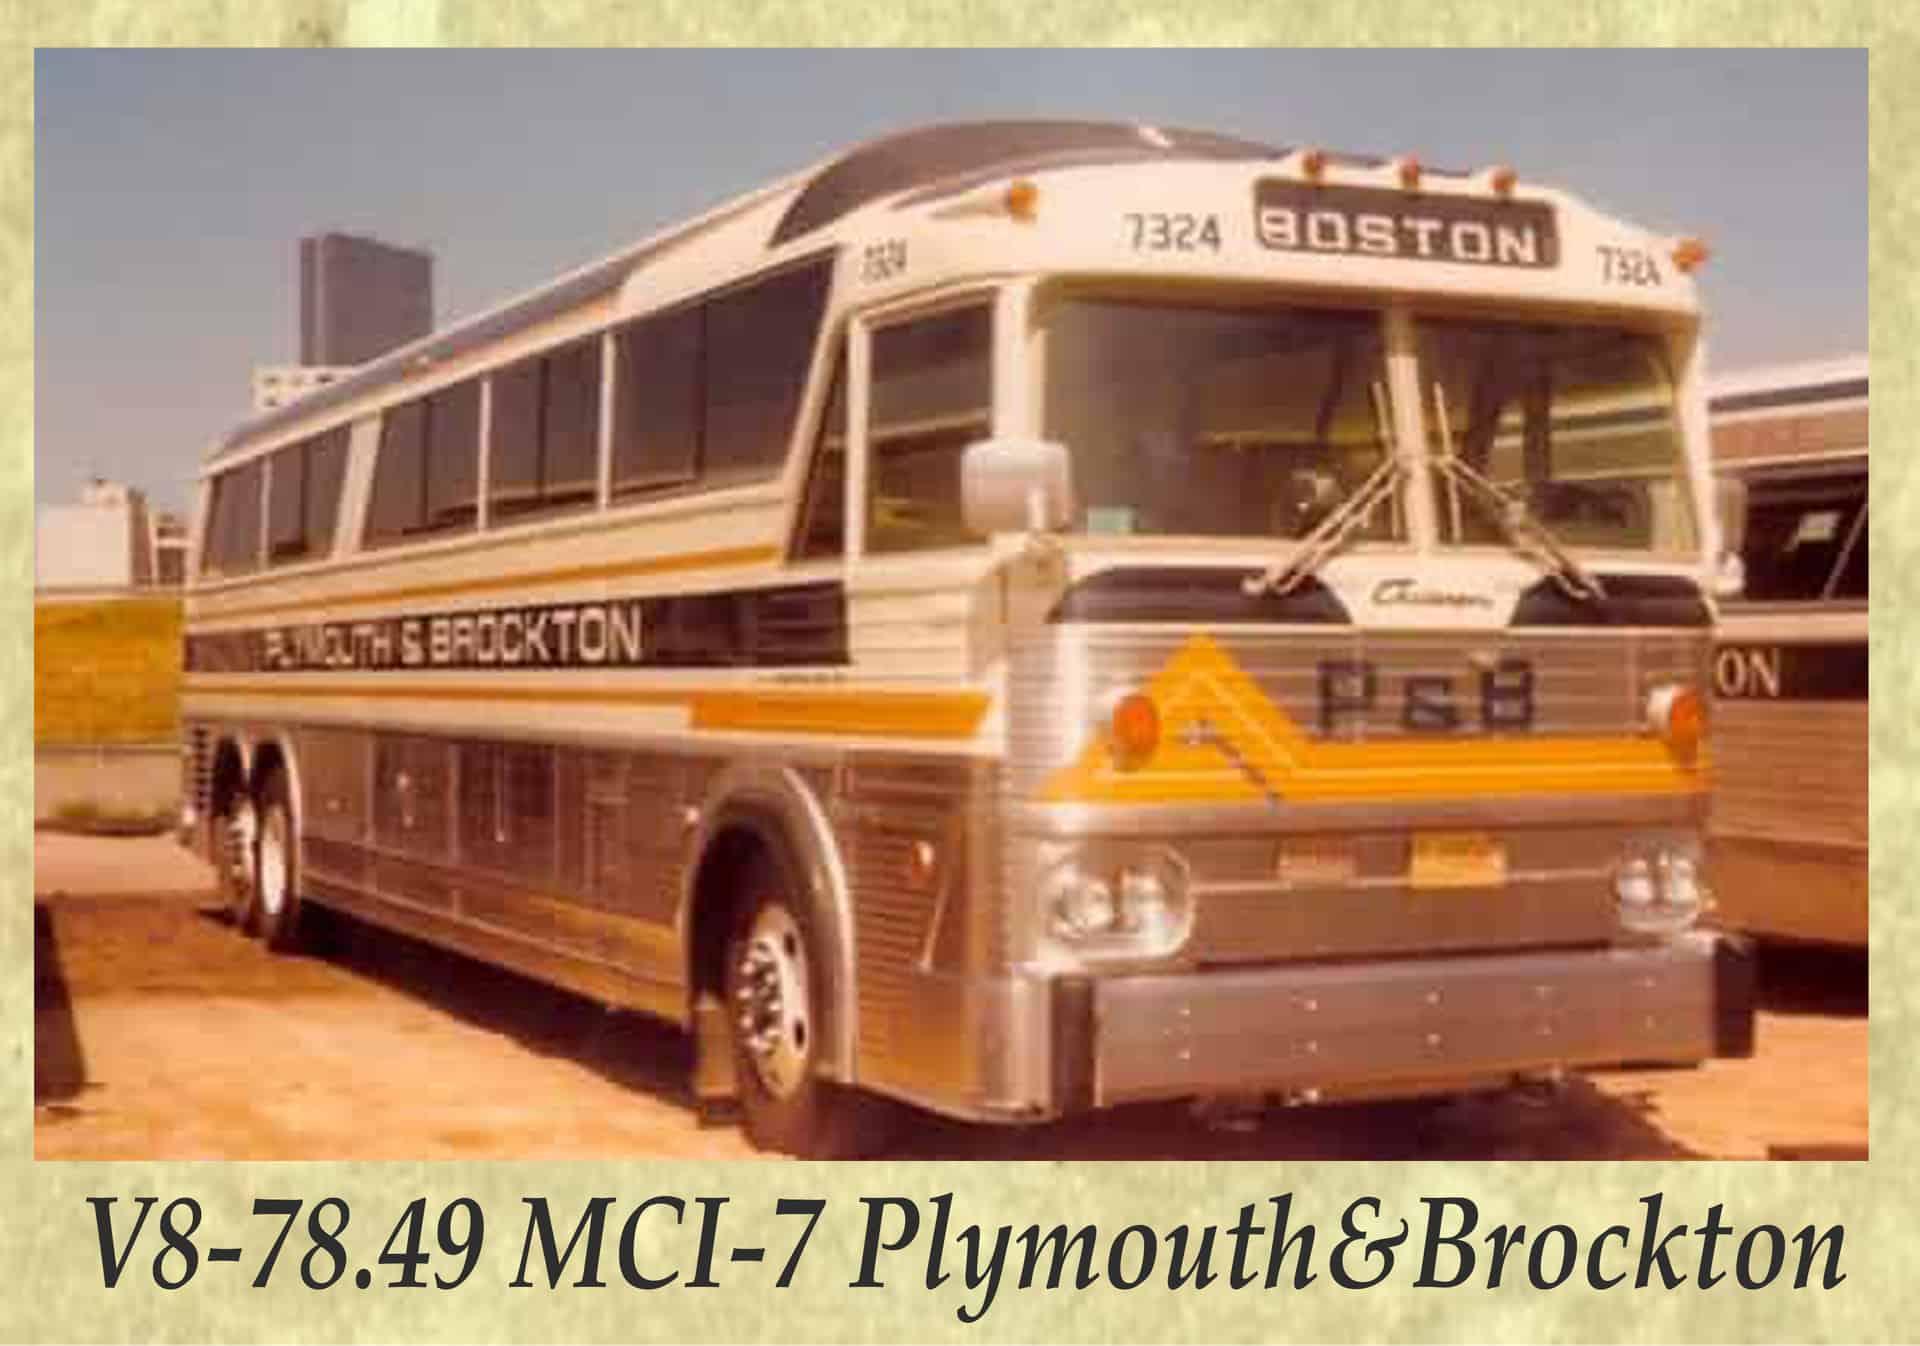 V8-78.49 MCI-7 Plymouth&Brockton